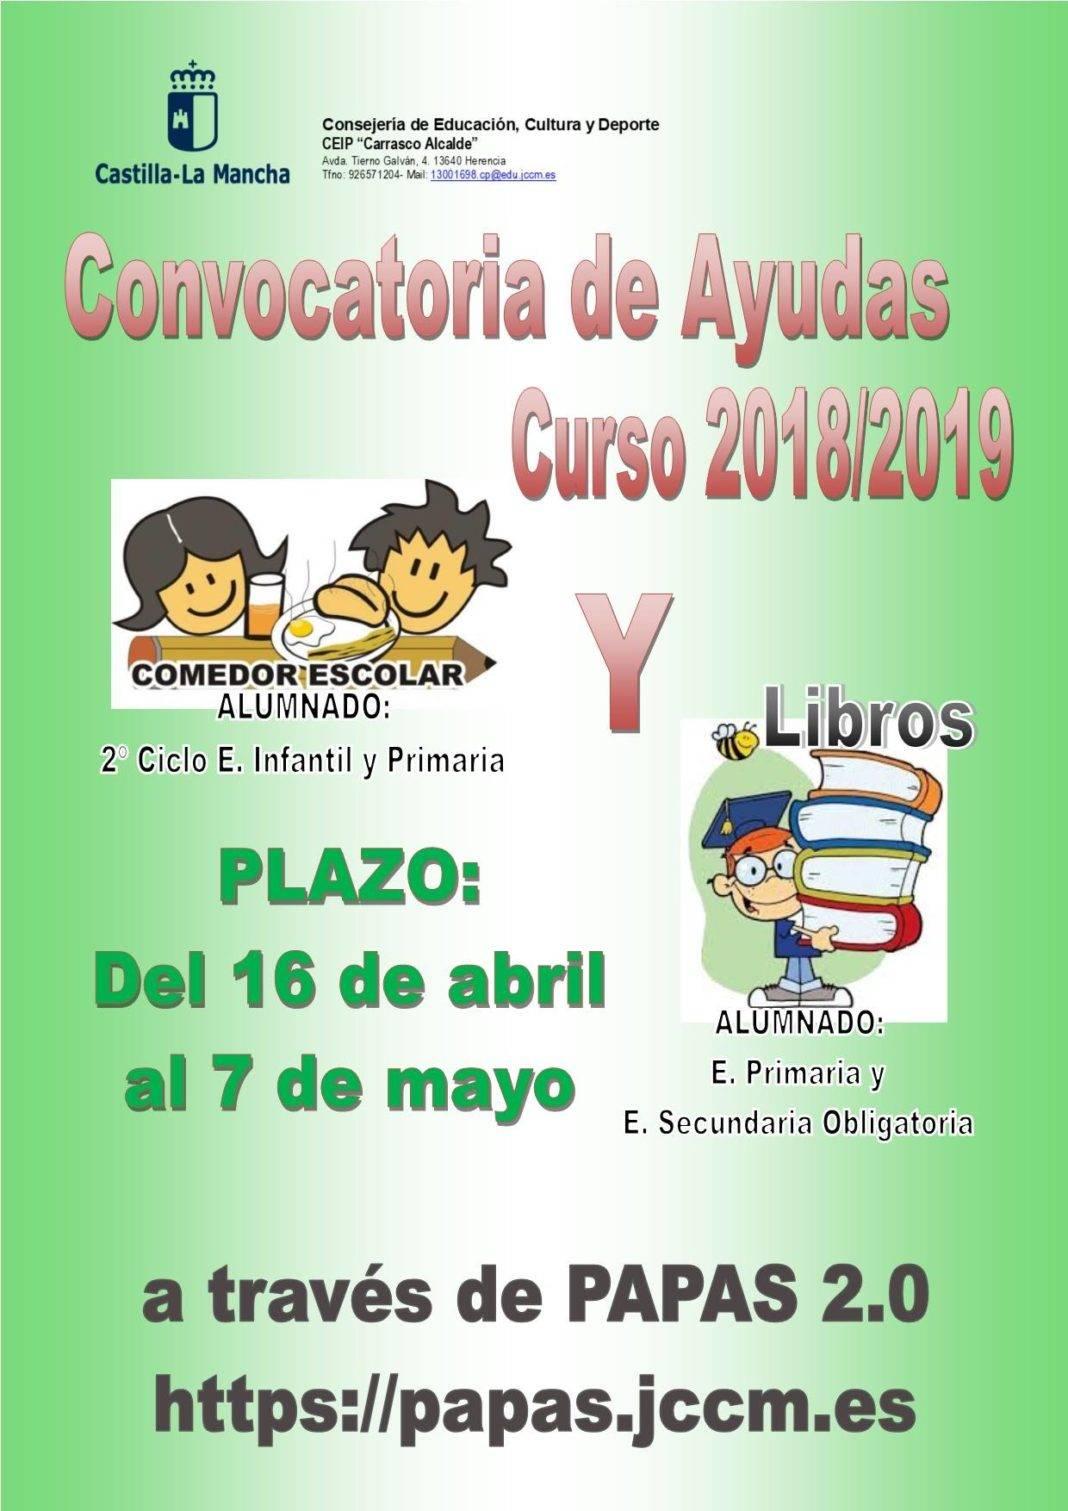 convocatoria ayuda libros comedor 1068x1511 - Convocatoria de ayudas para comedor escolar y libros para curso 2018/2019